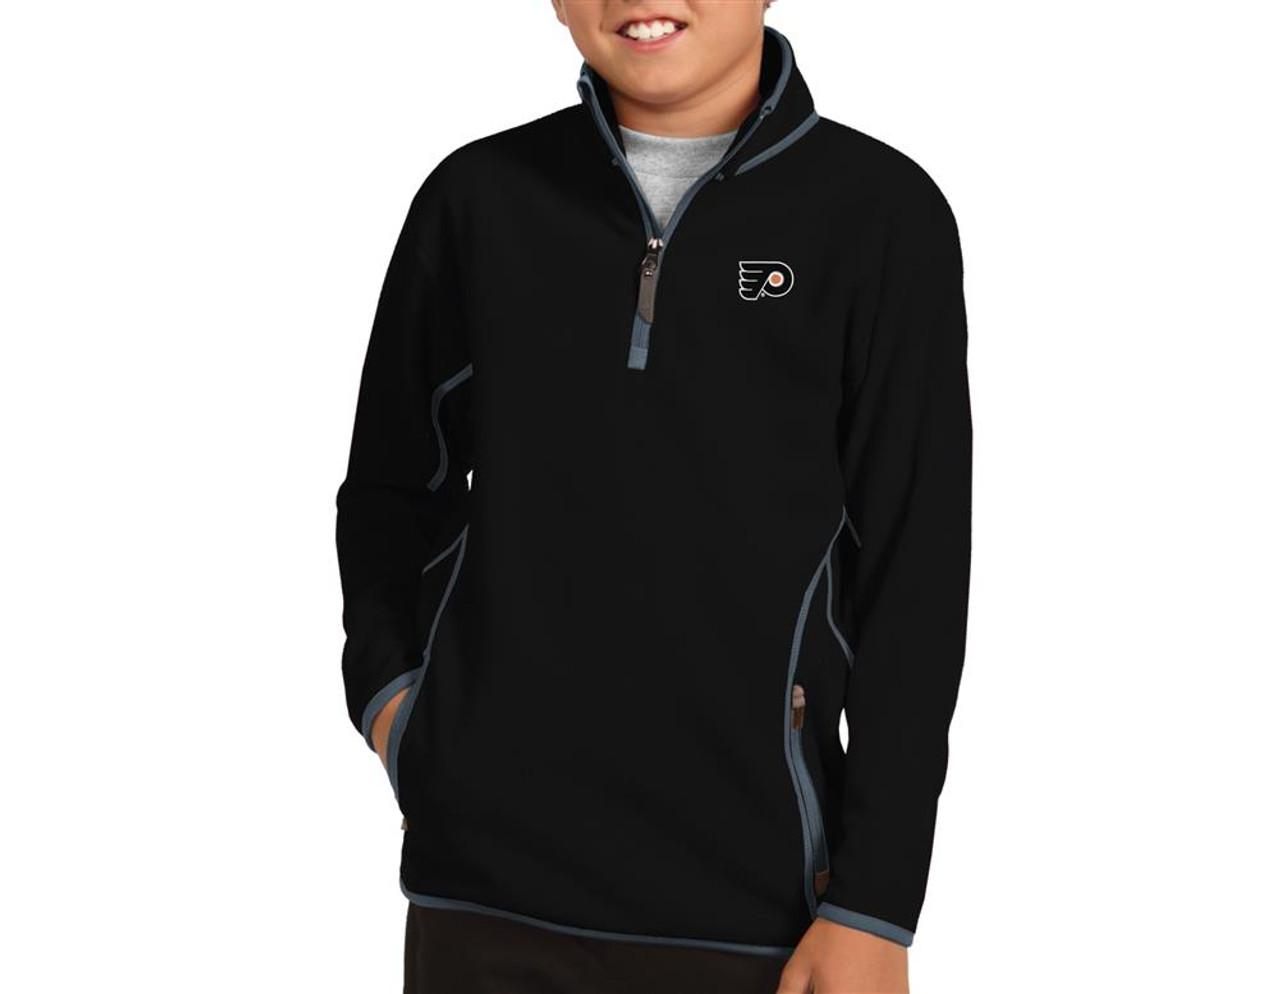 Los Angeles LA Kings Youth Pullover Jacket